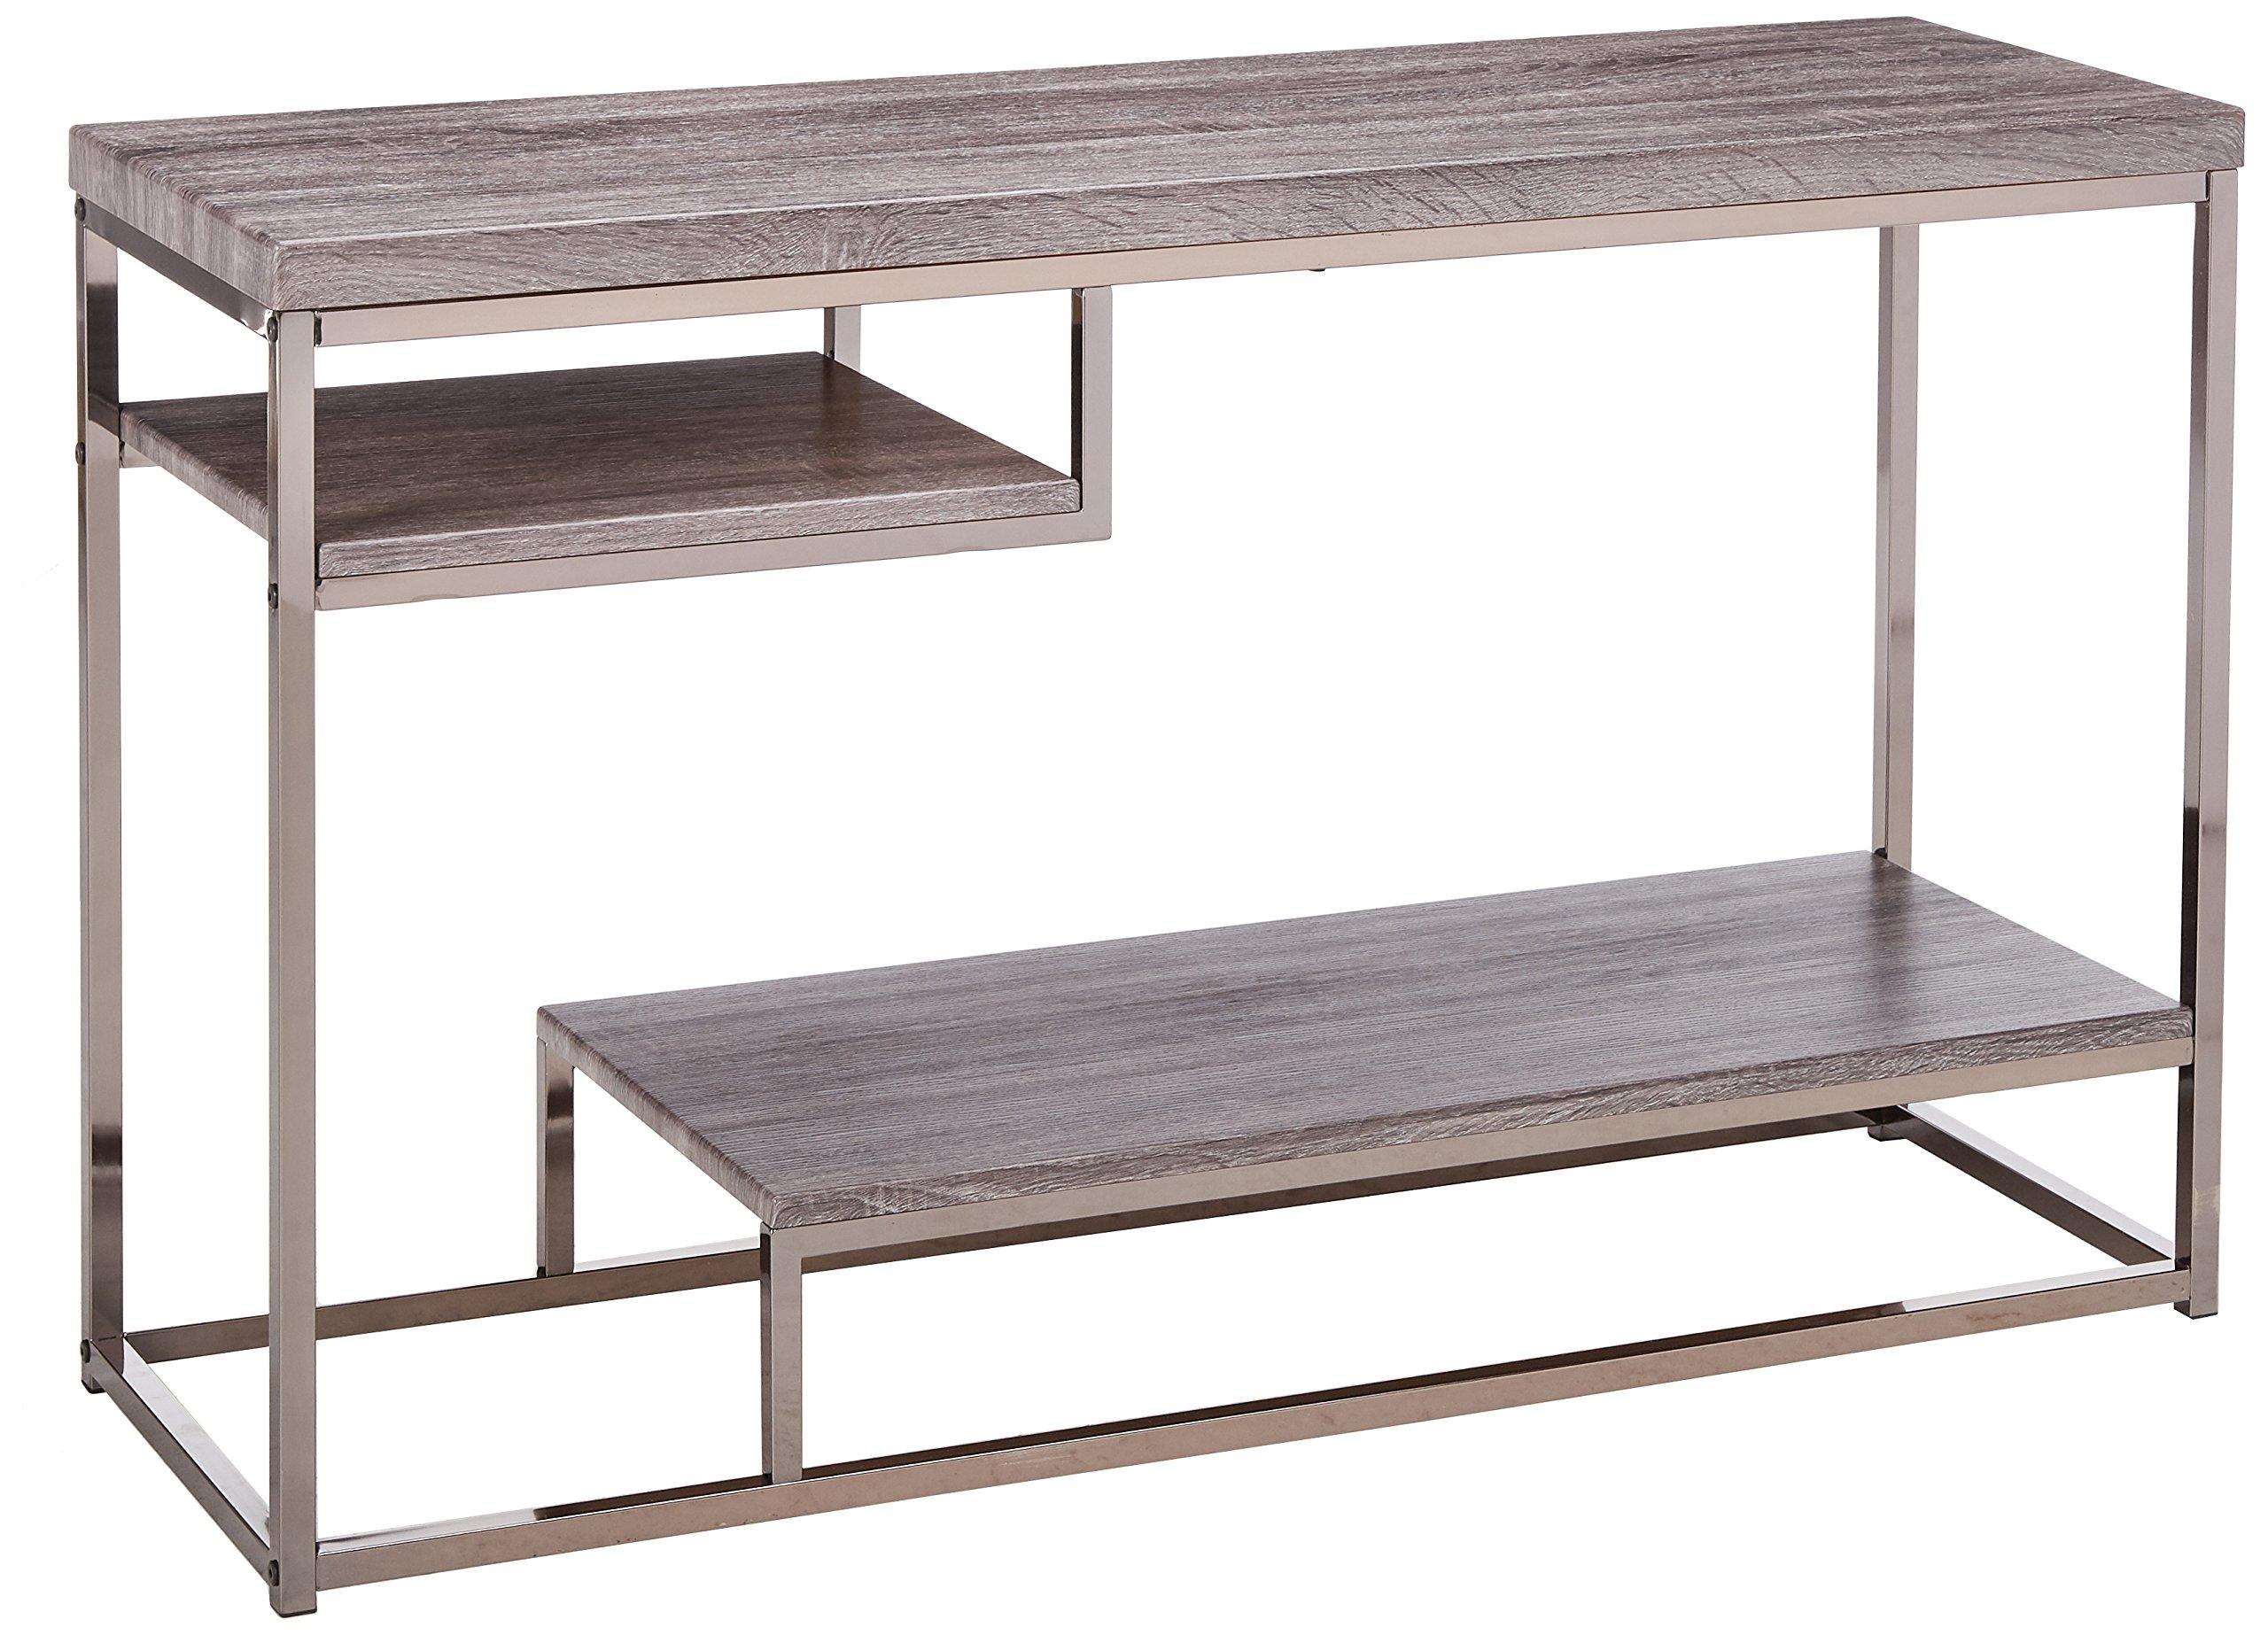 Coaster Home Furnishings 2-Shelf Sofa Table Weathered Grey and Black Nickel by Coaster Home Furnishings